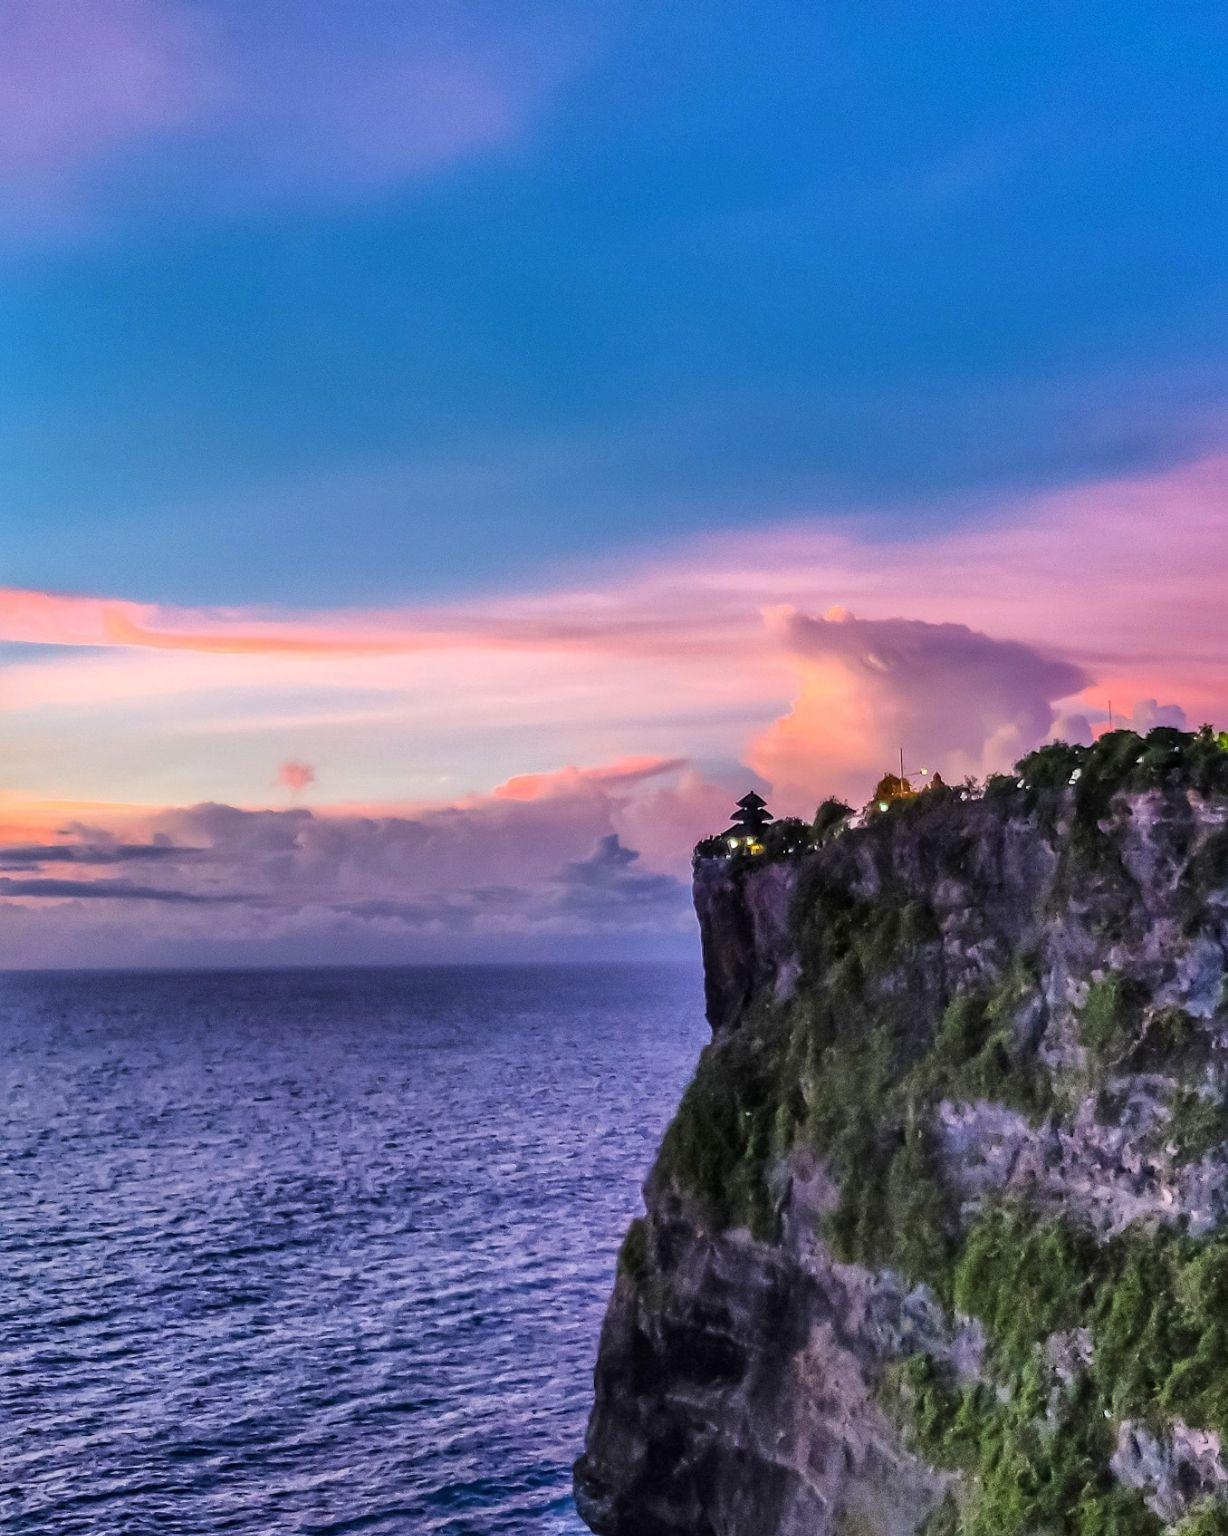 Photo of Bali By Siddharth Mishra